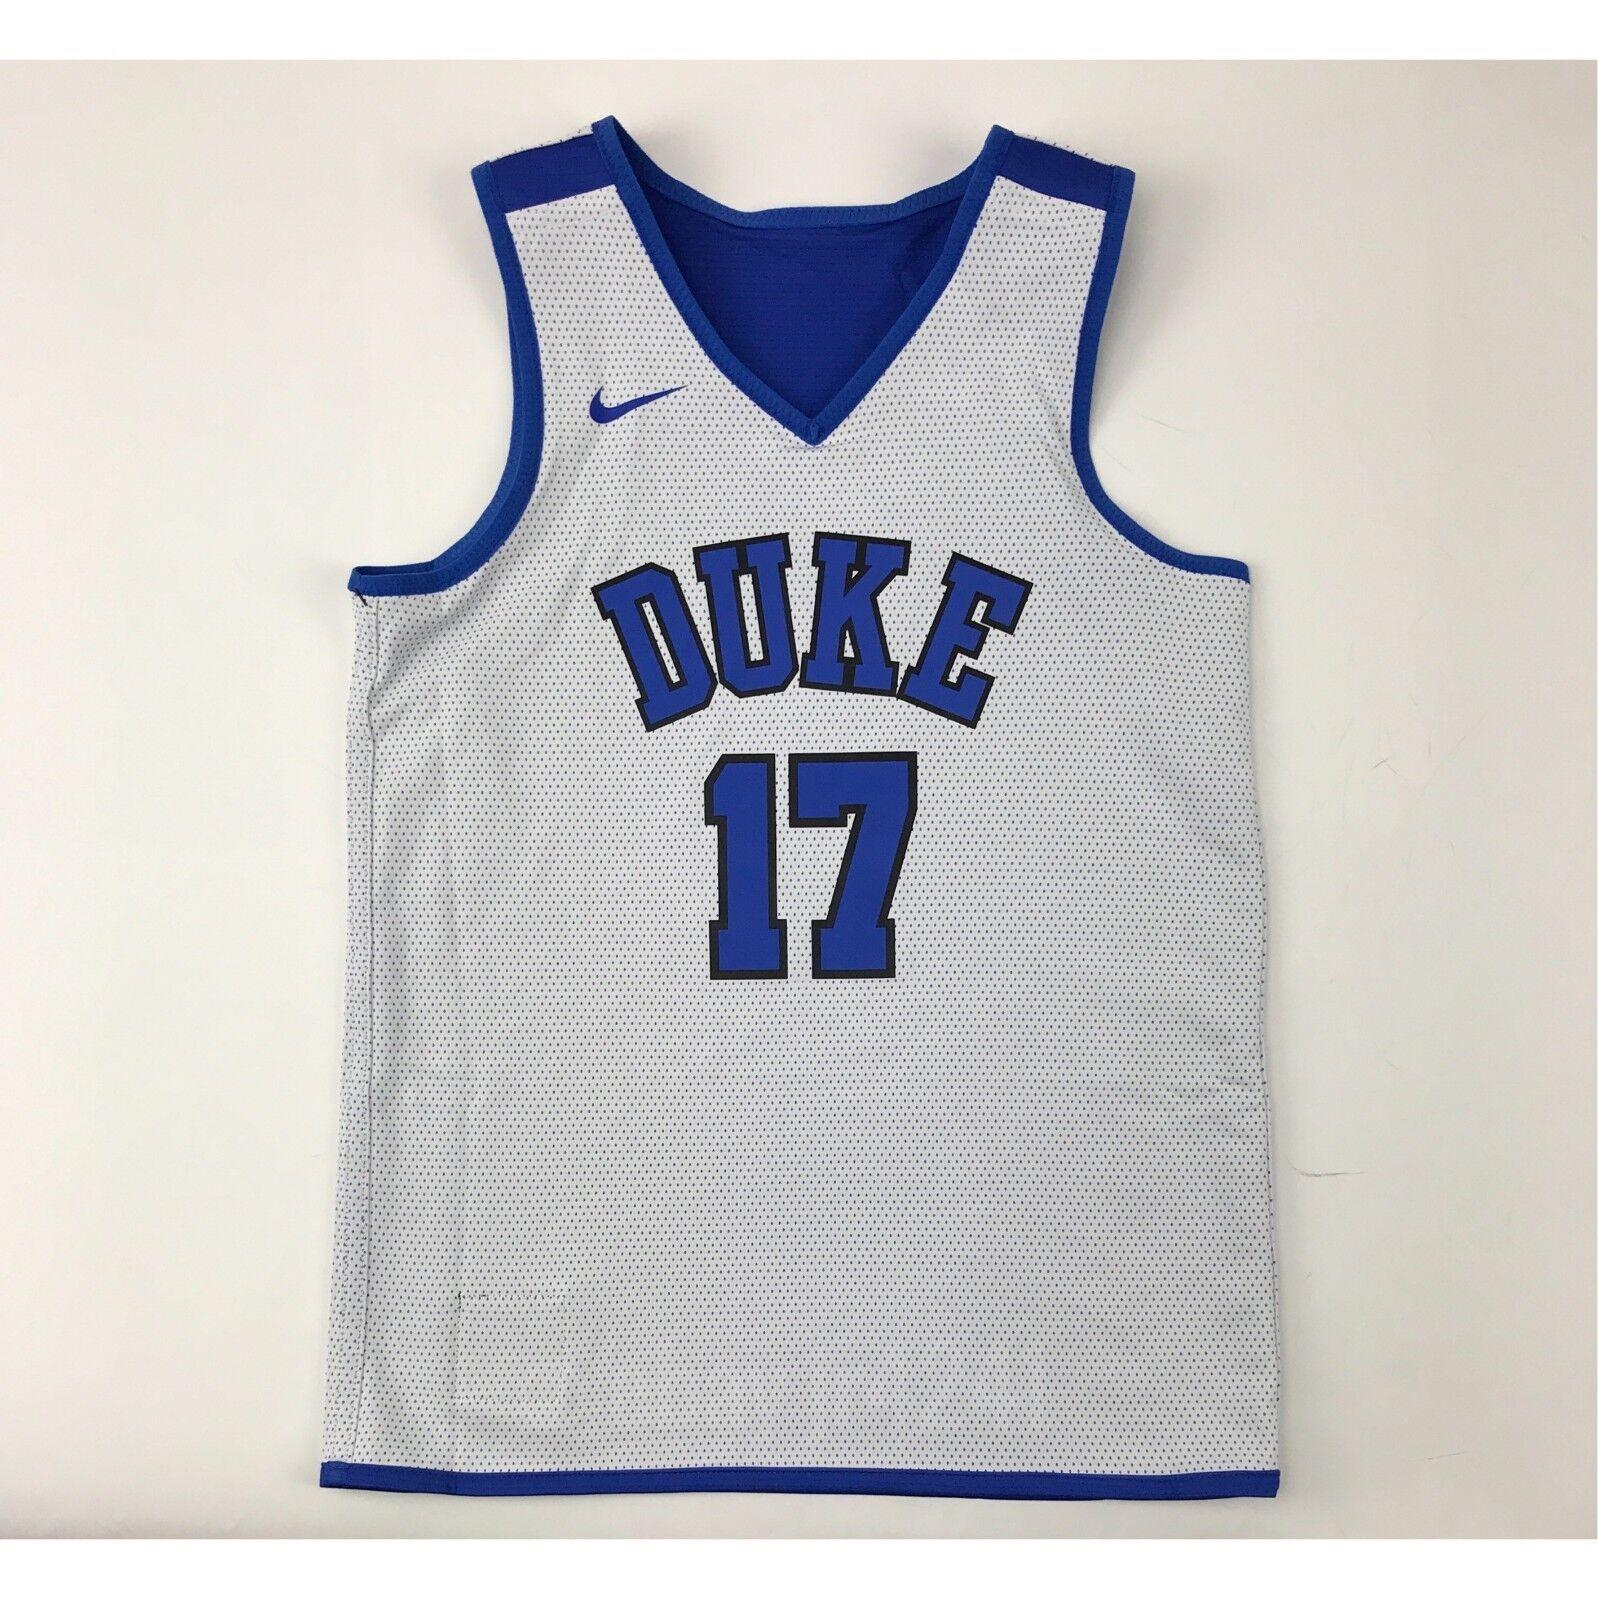 9433ed820cc7 New Nike Boy s M Duke Blue Devils Elite Reversible Basketball Jersey Blue  White